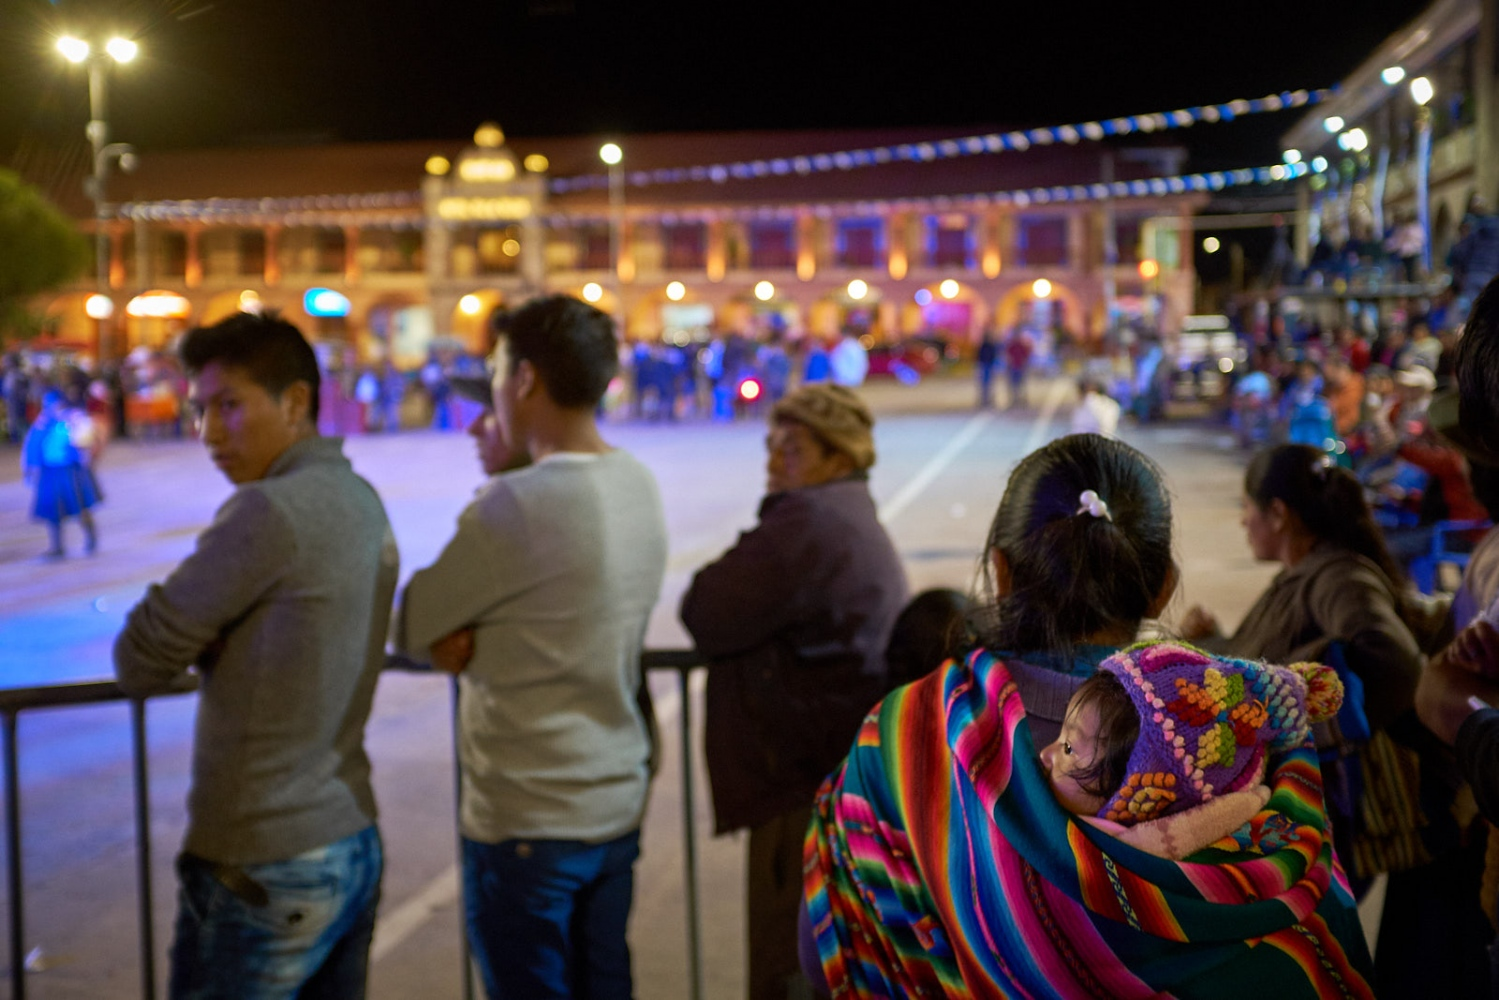 Mother and child during a town festival, Plaza de Armas, Calca, Peru.